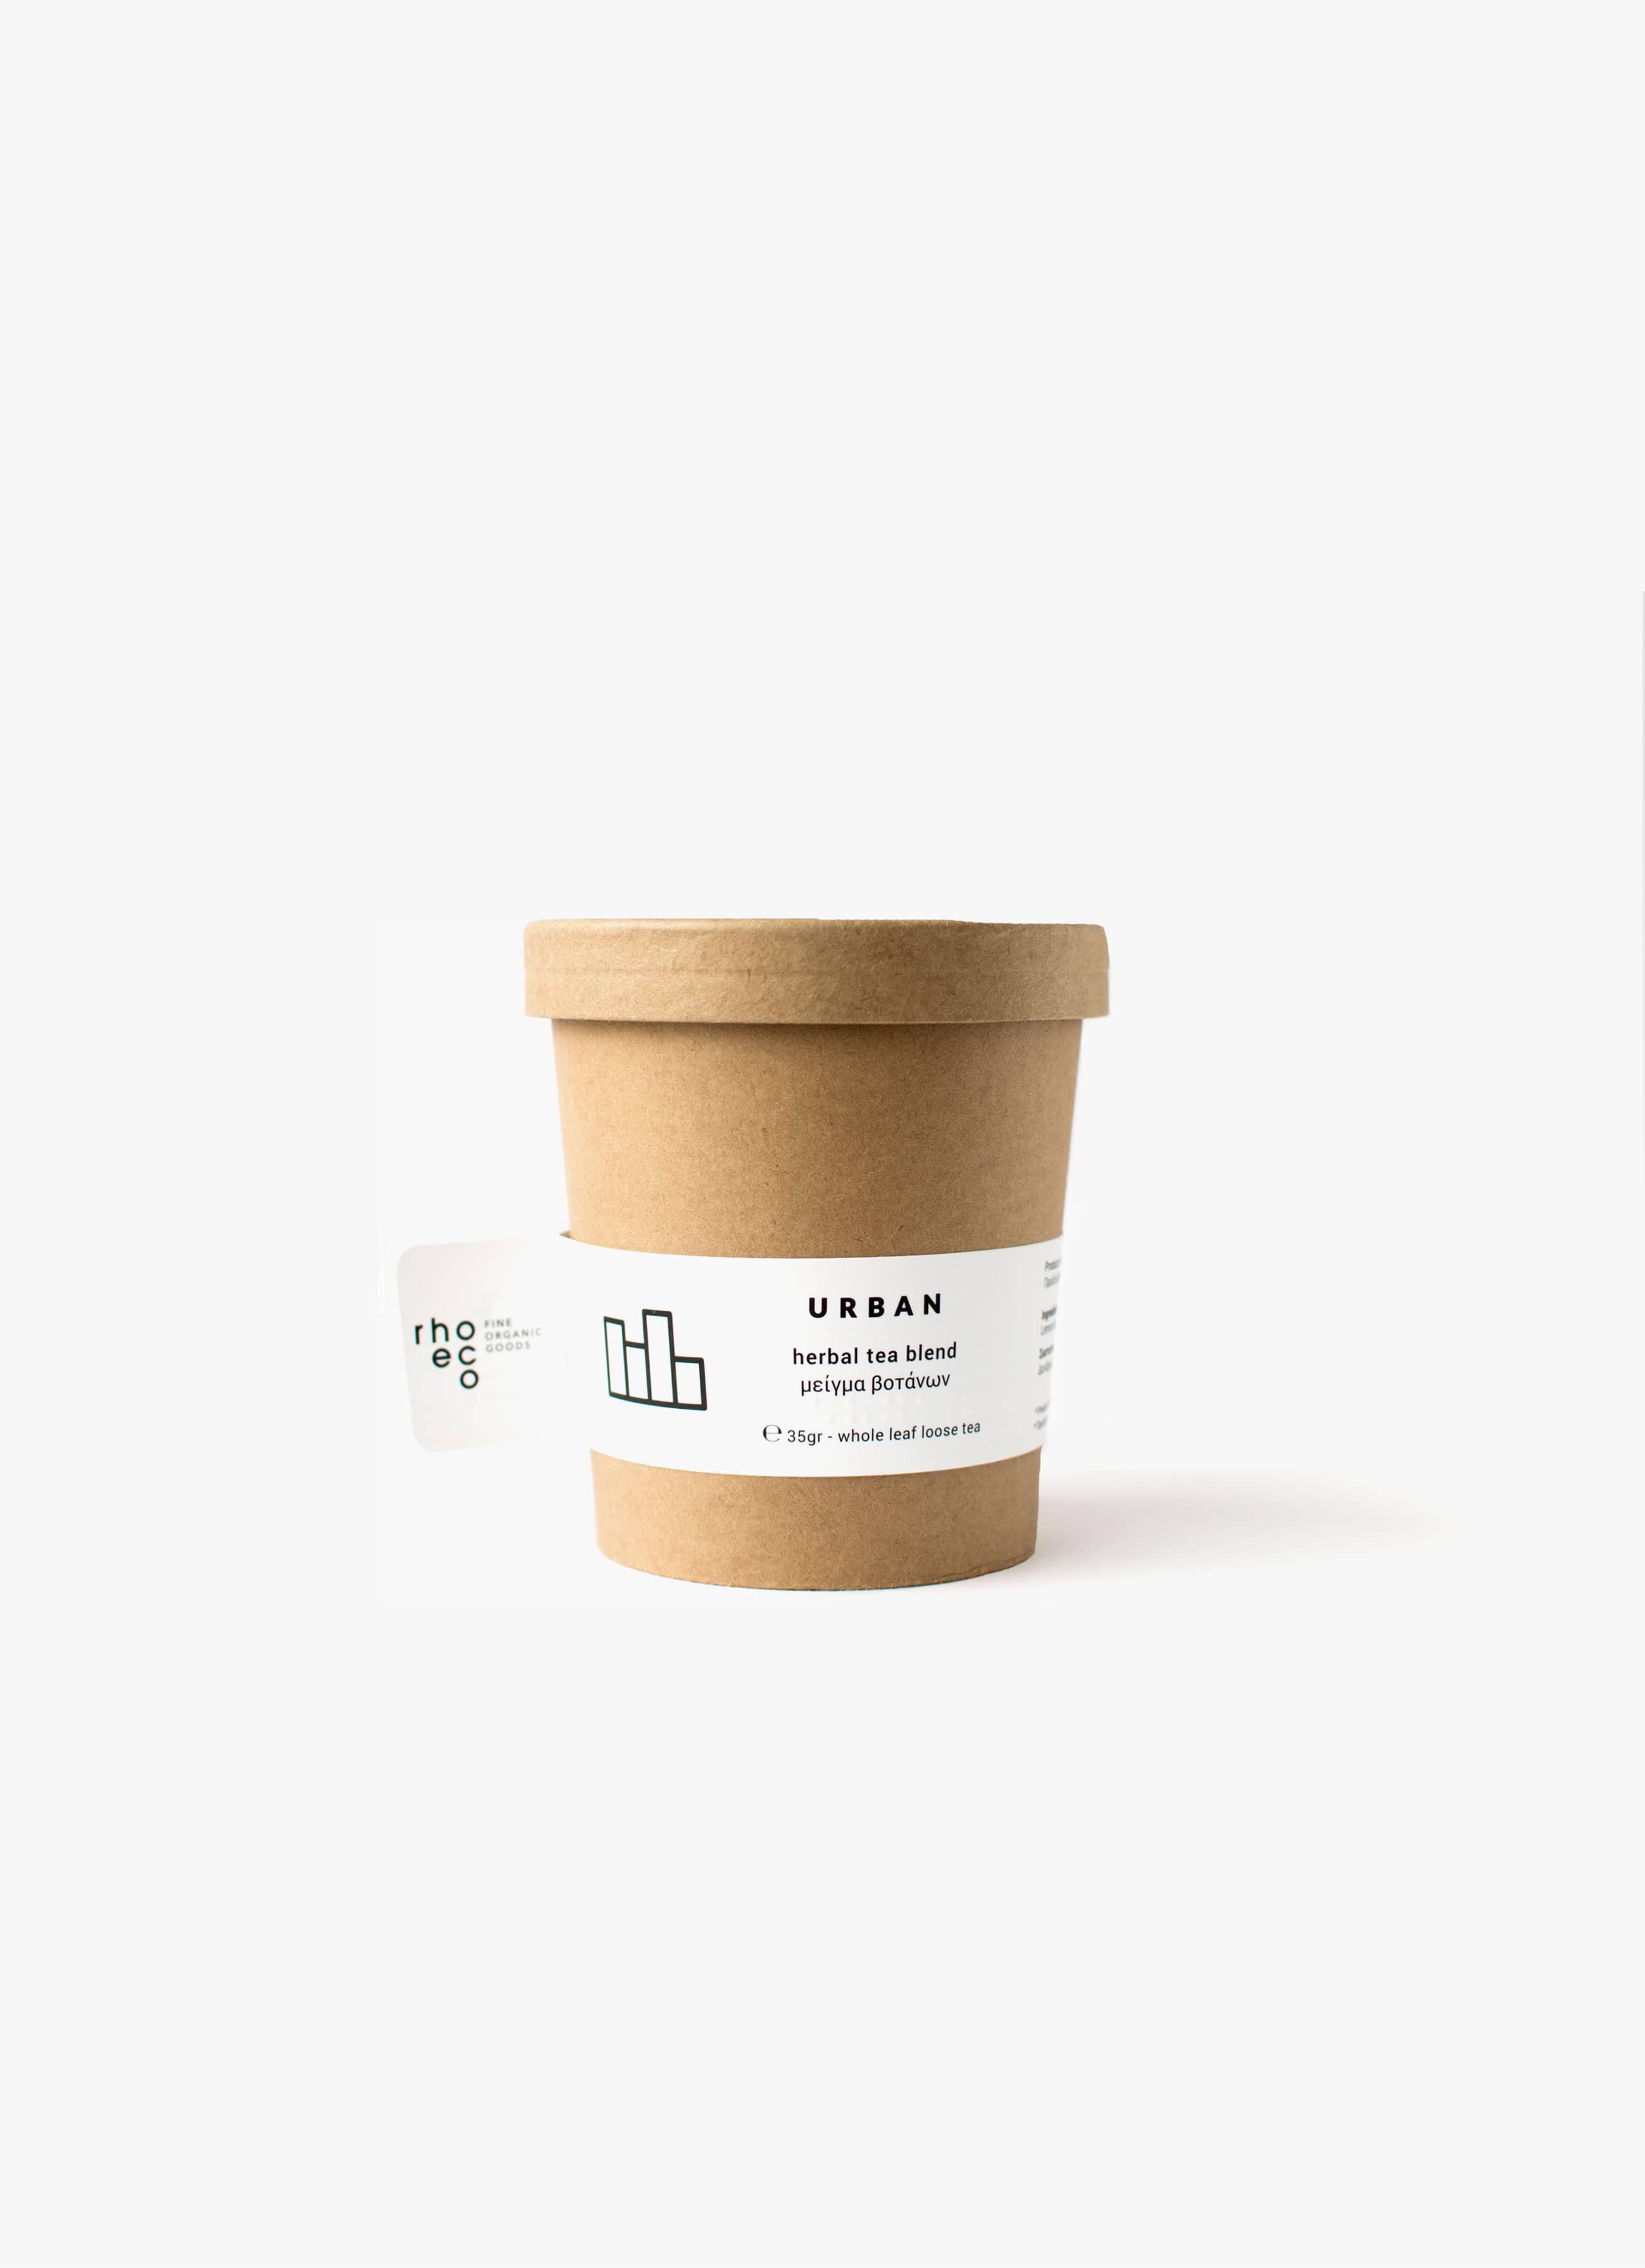 Rhoeco - Organic Tea - Drink it - Plant it - Urban